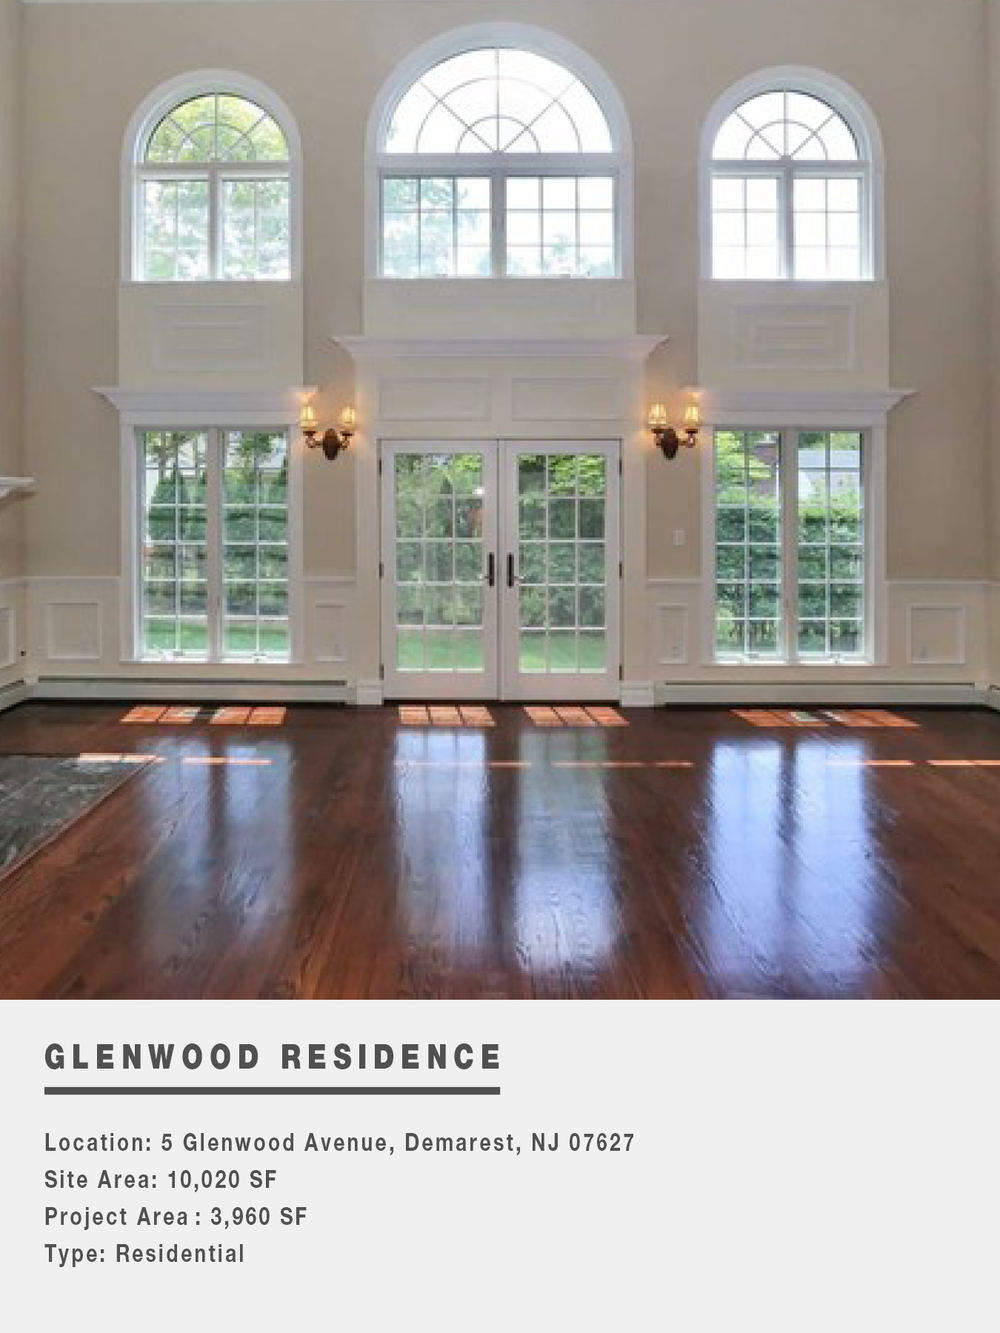 GLENWOOD RESIDENCE